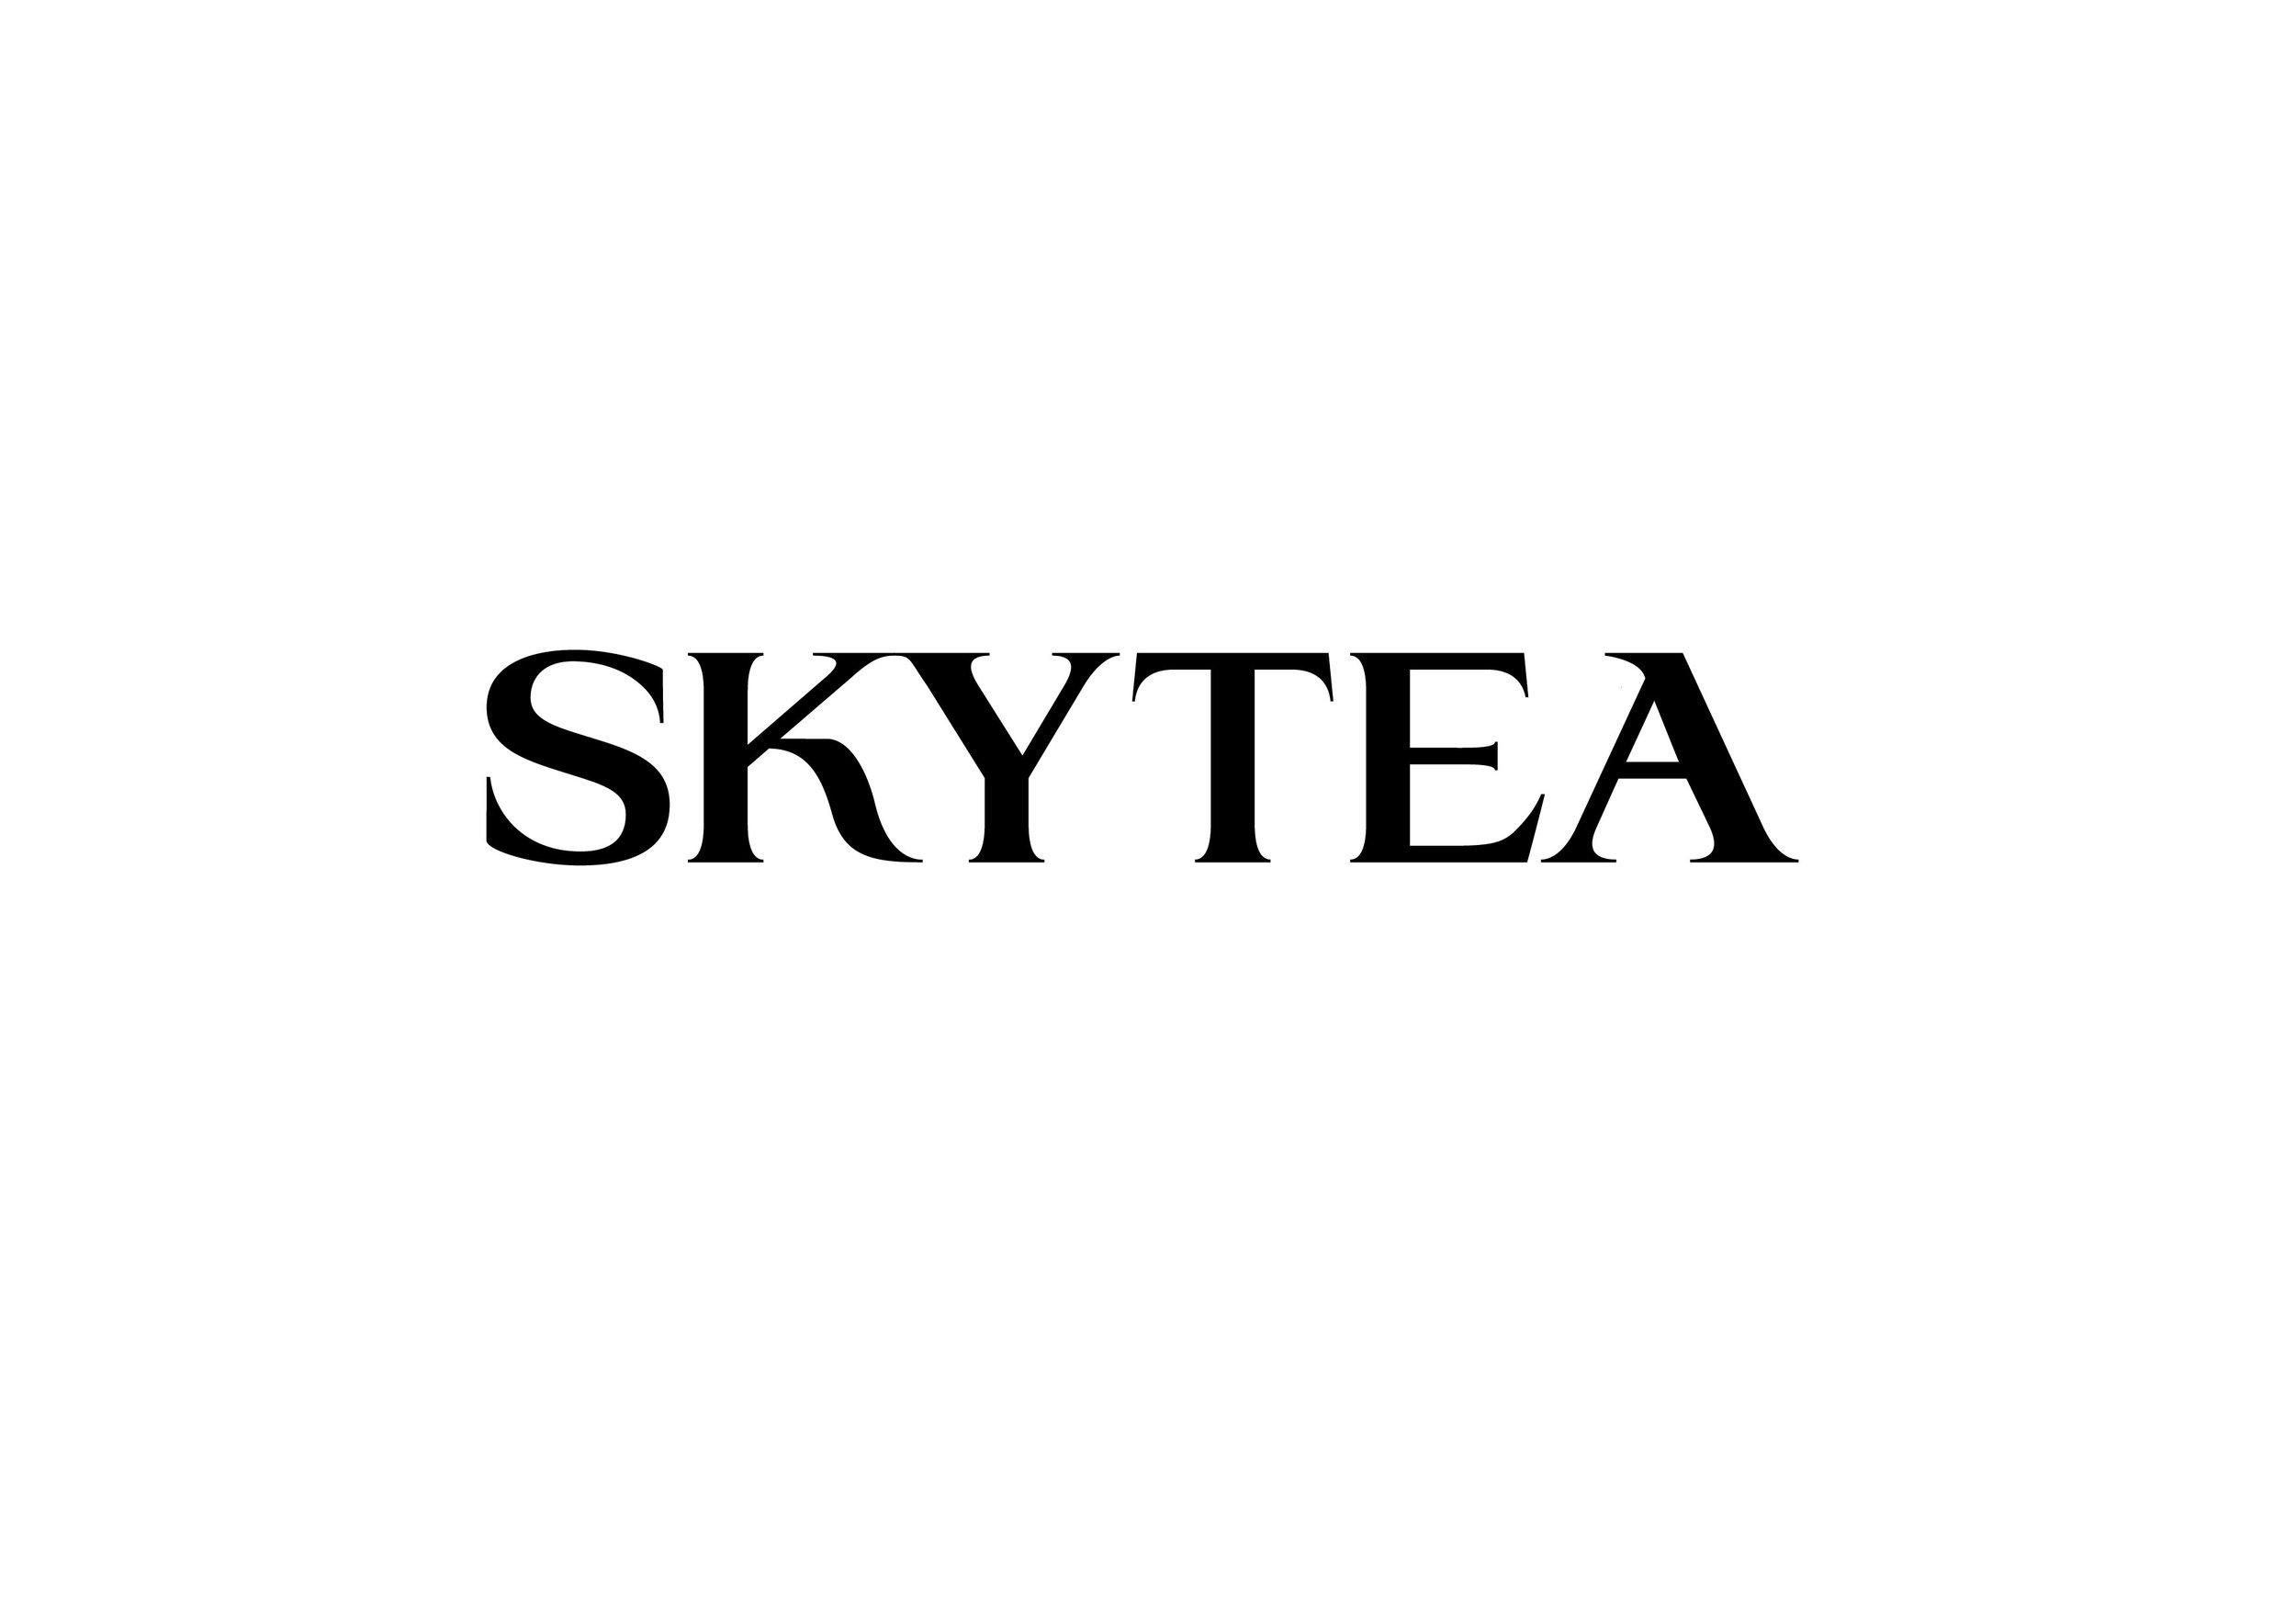 190215_SkyTea_logo-03.jpg